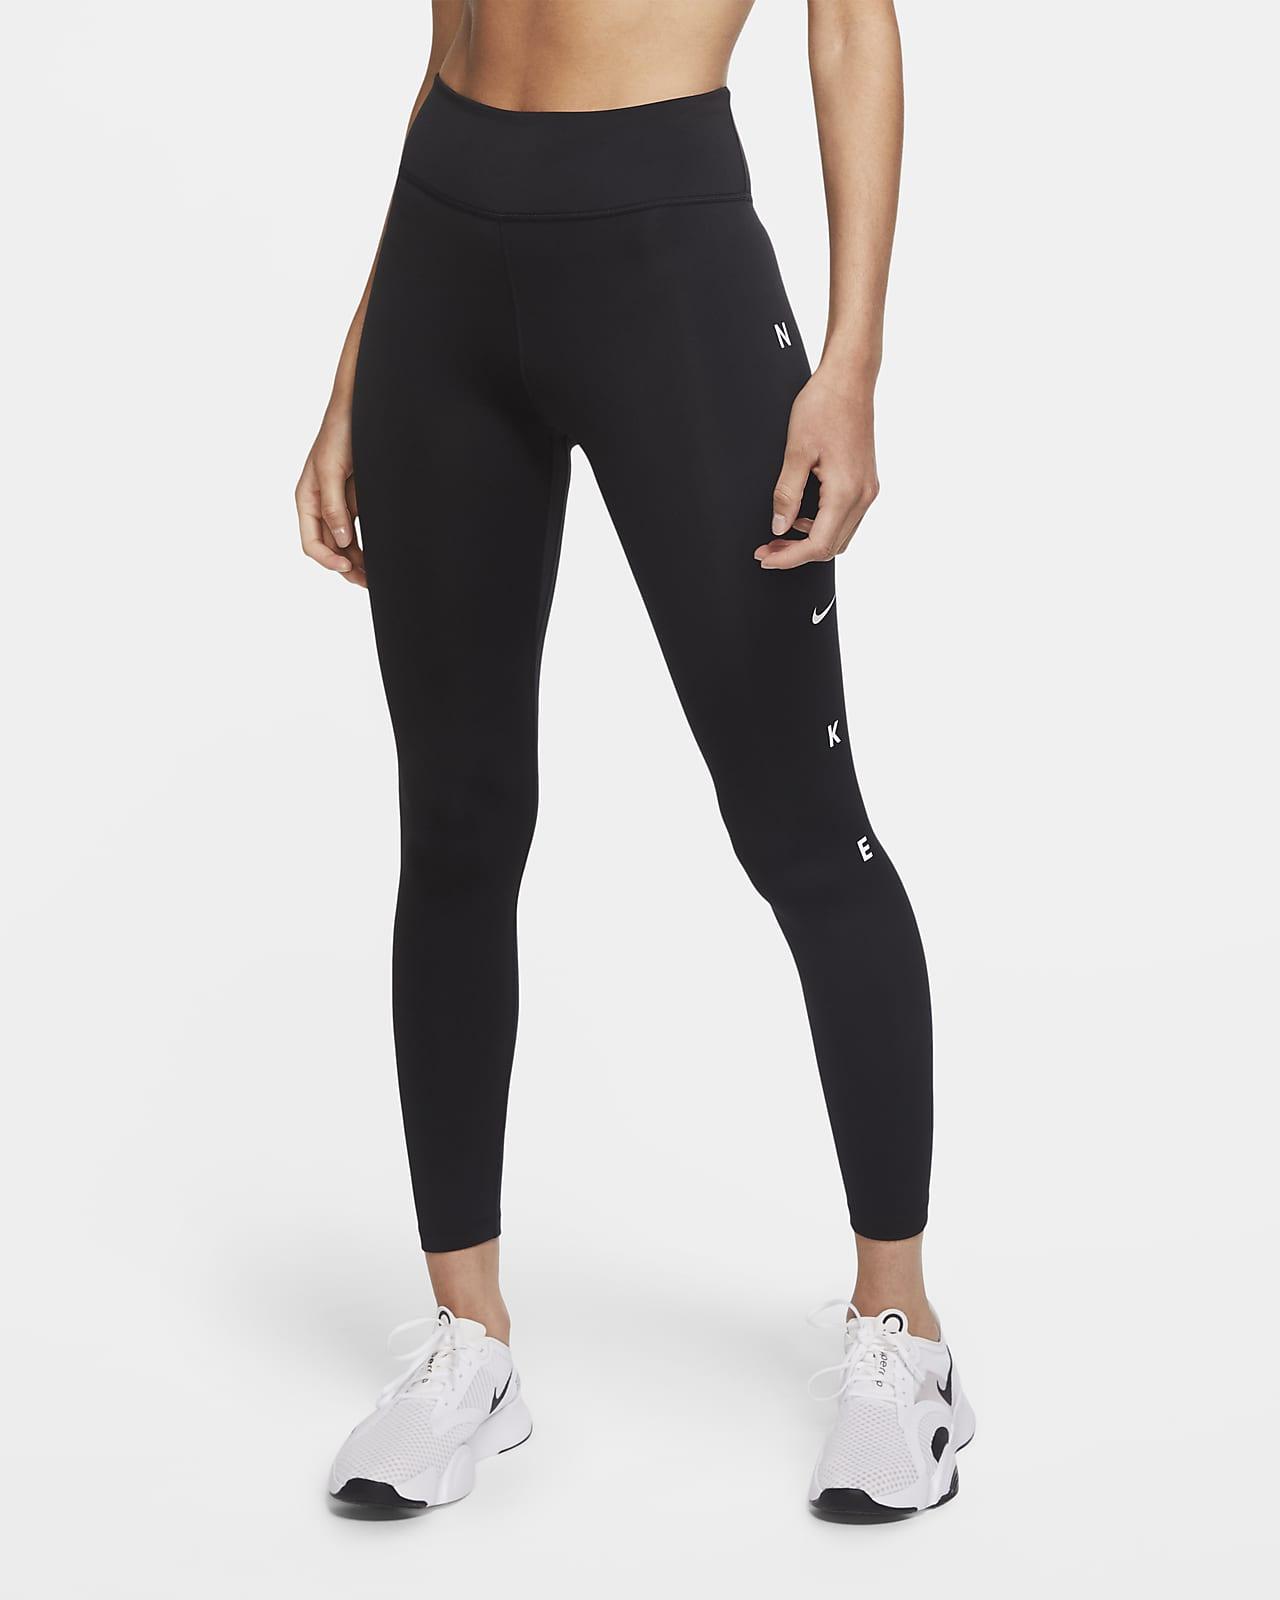 Nike One Women's 7/8 Graphic Leggings